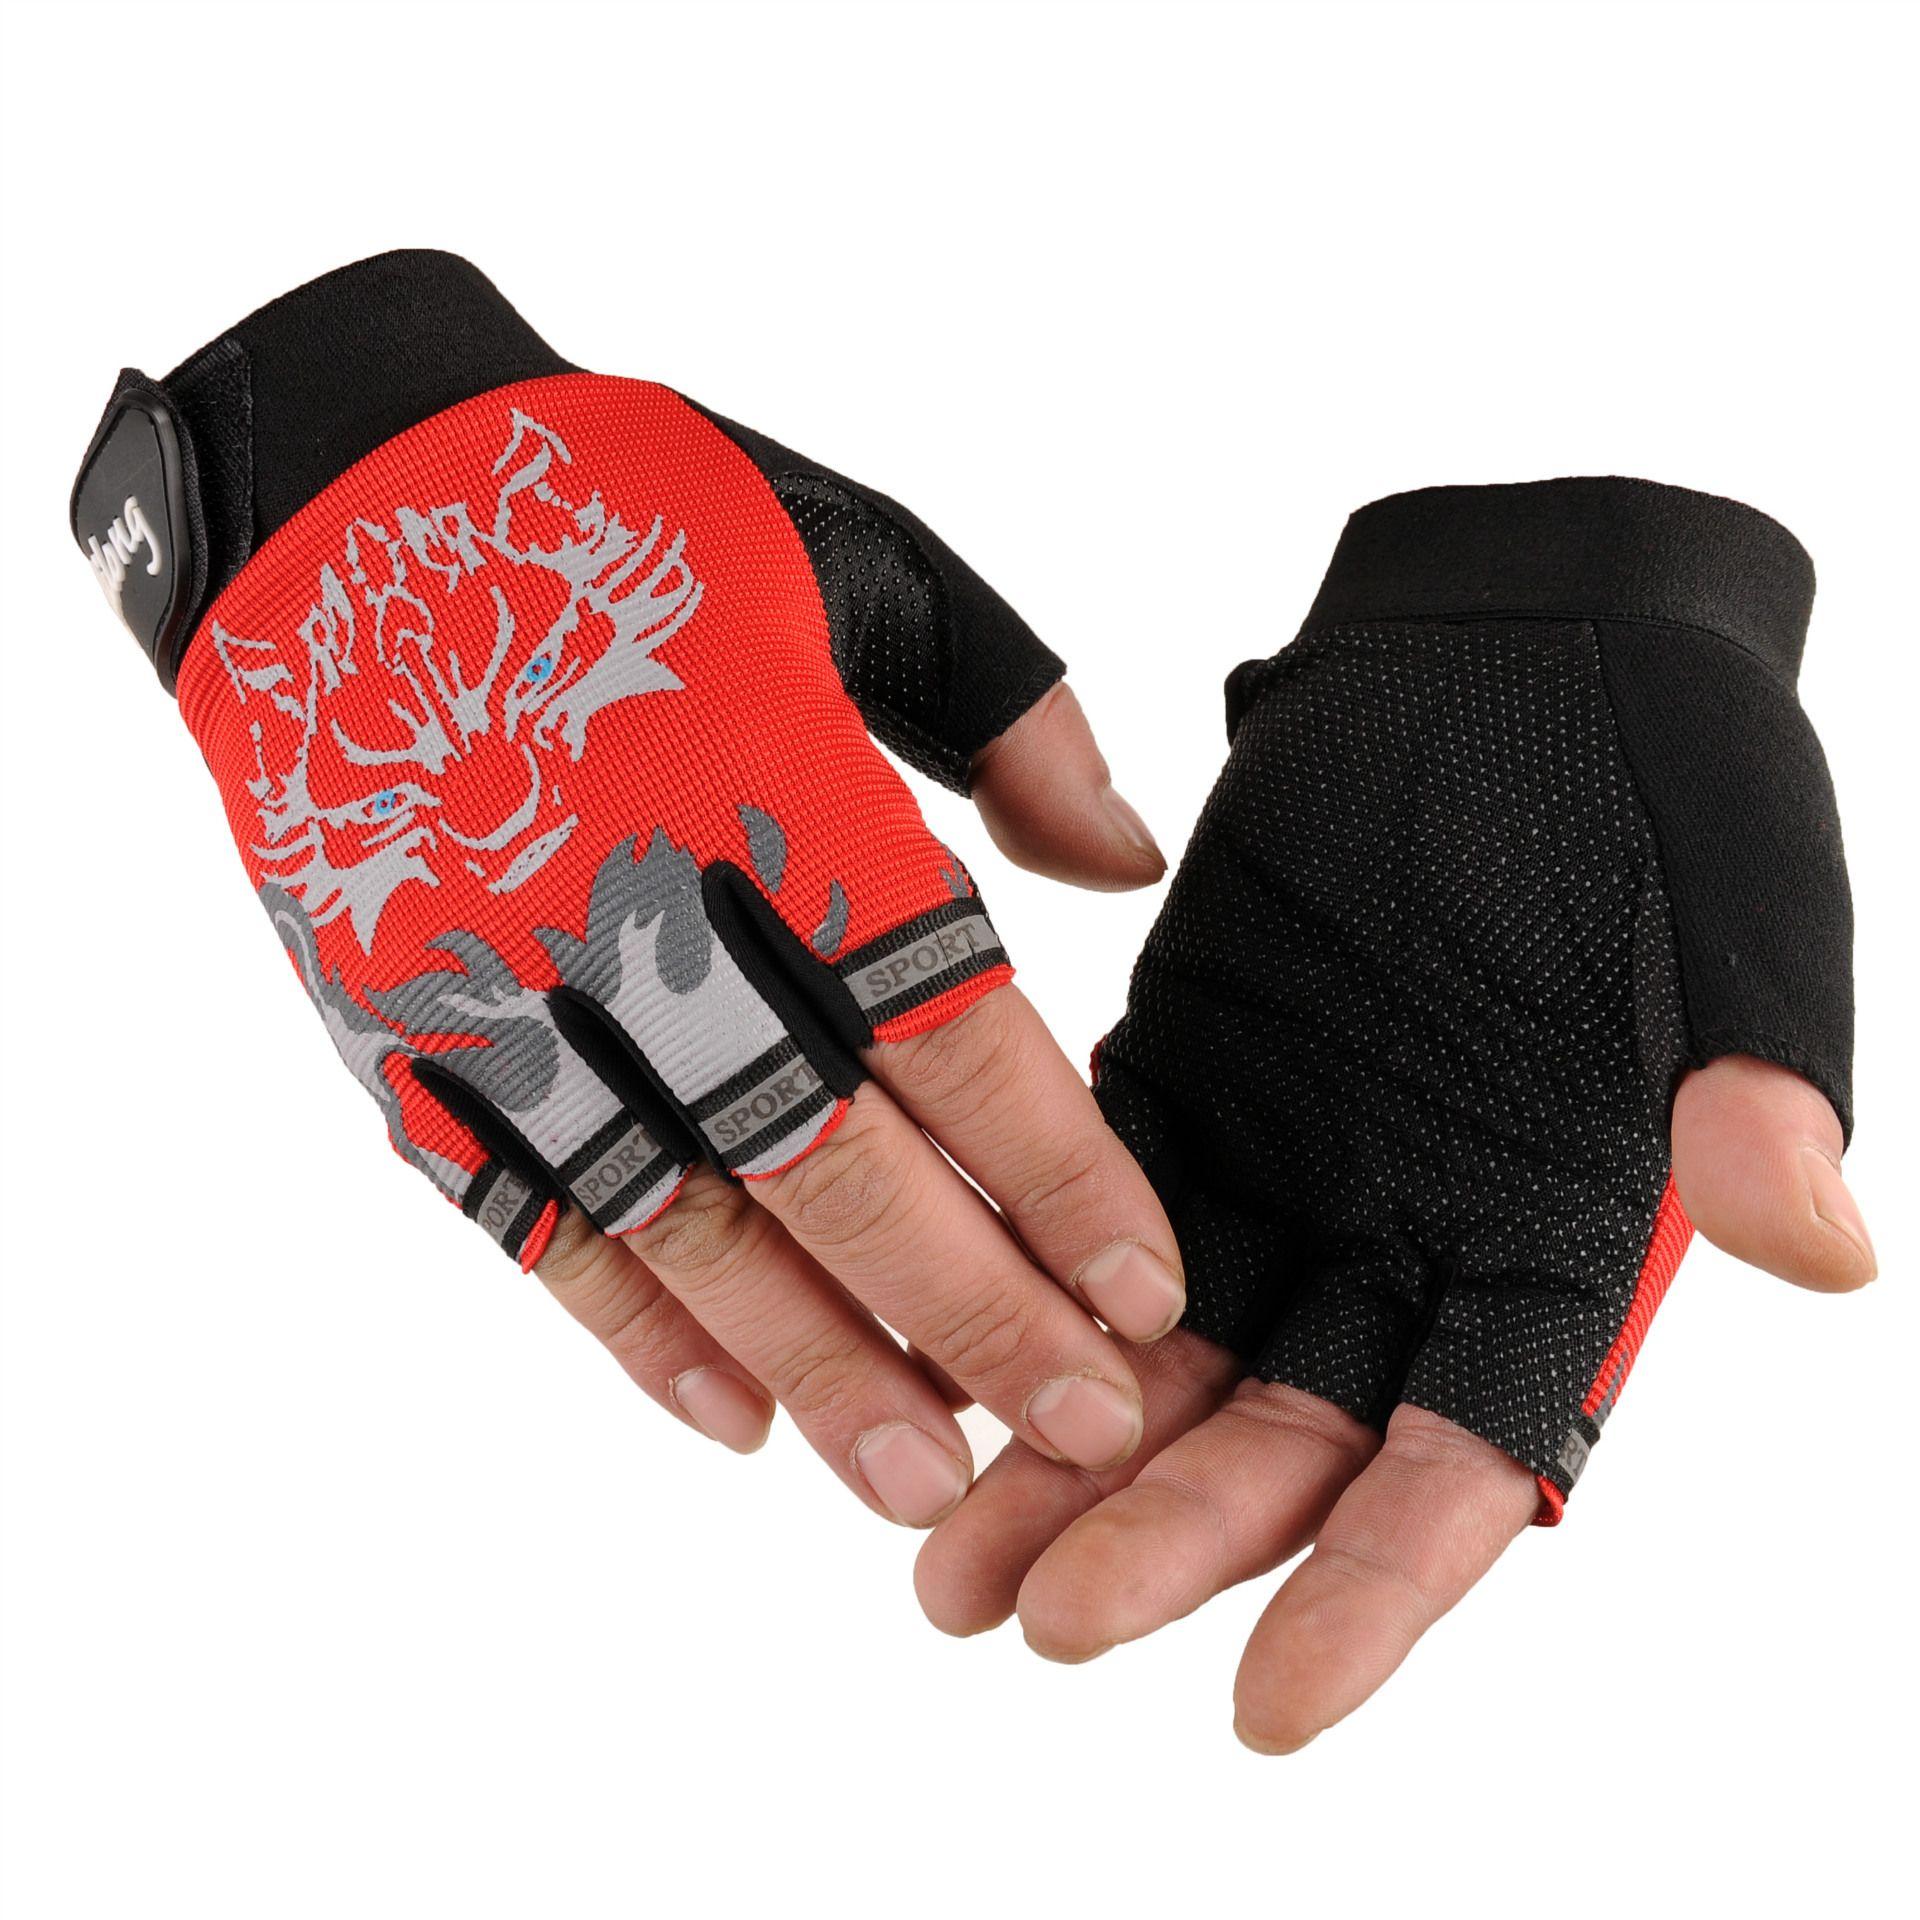 Fingerless gloves climbing - See Larger Image